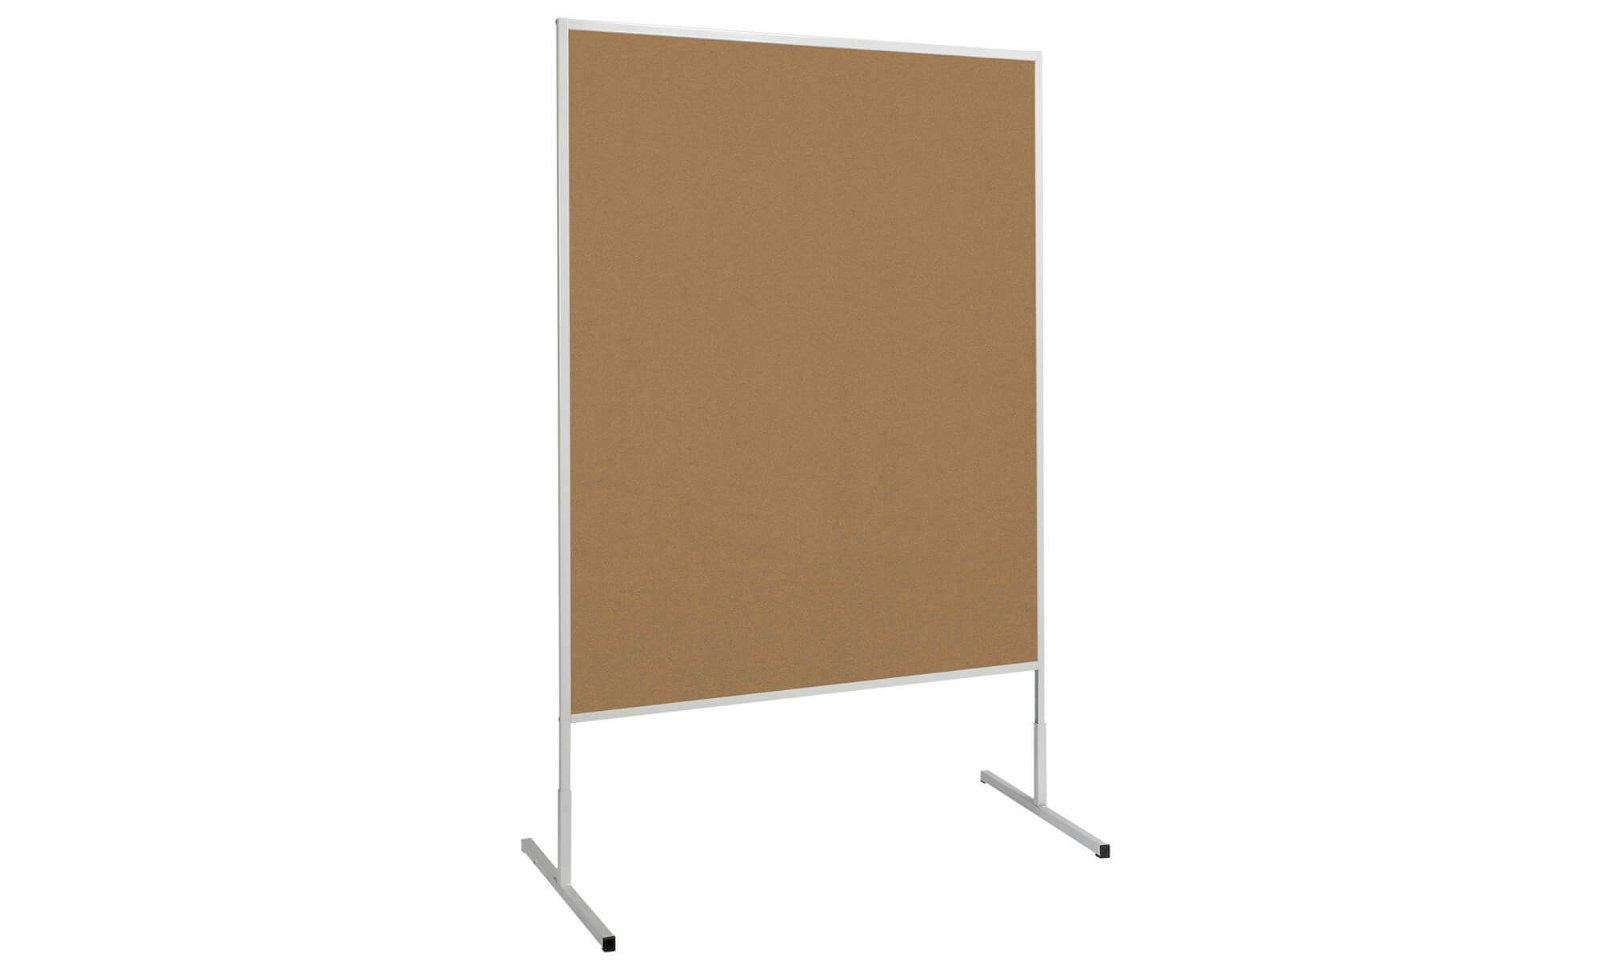 Moderationstafel MAULstandard Karton, 150x120 cm, grau